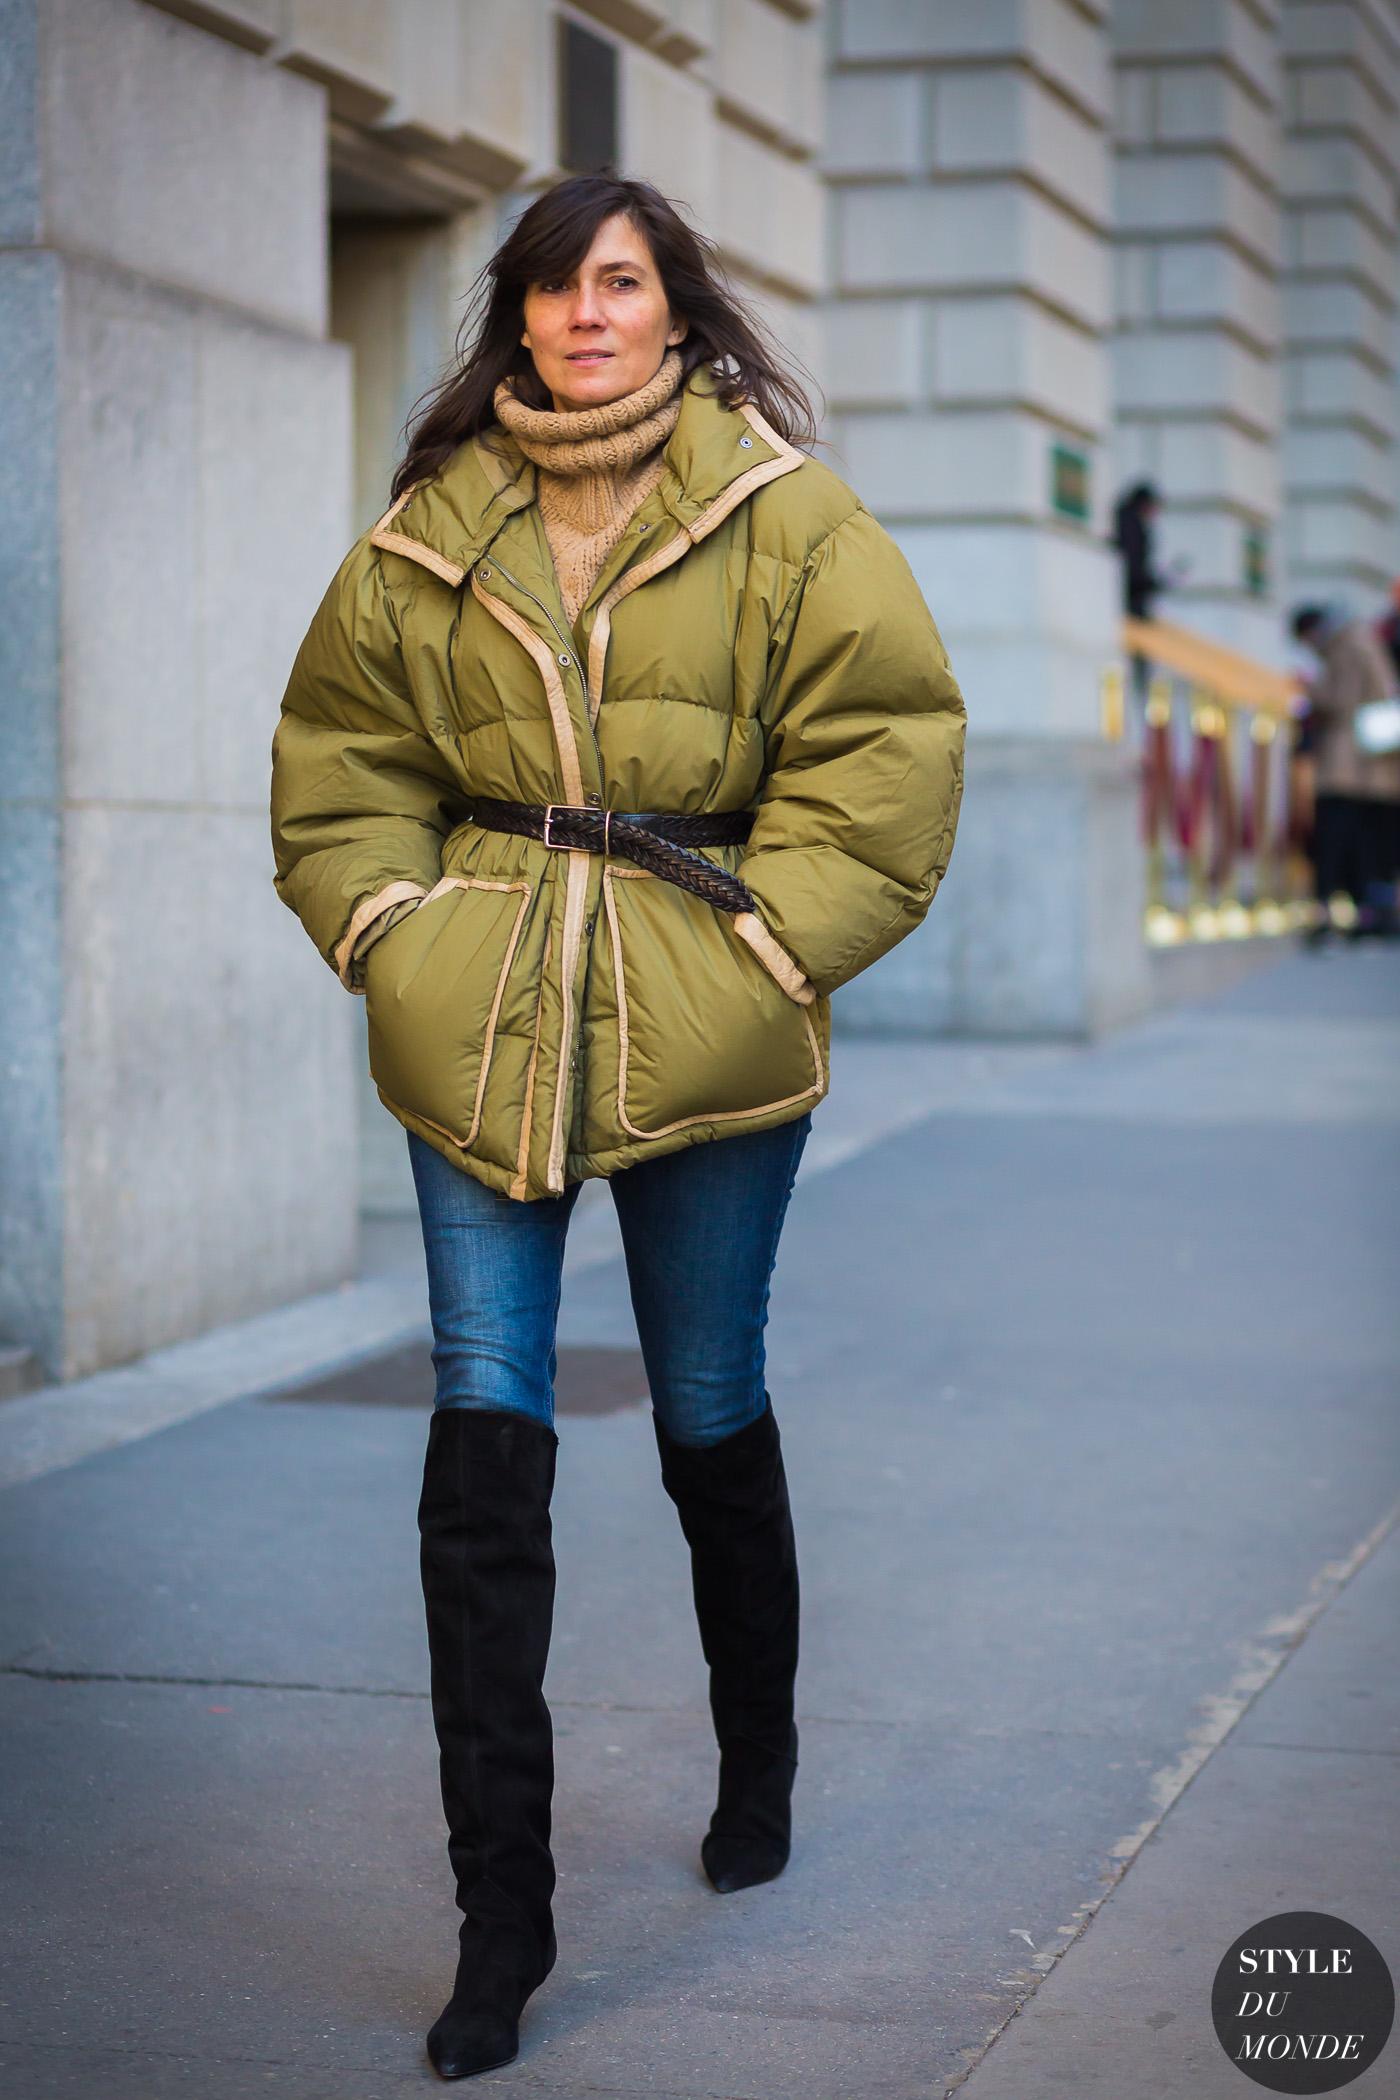 emmanuelle-alt-by-styledumonde-street-style-fashion-photography